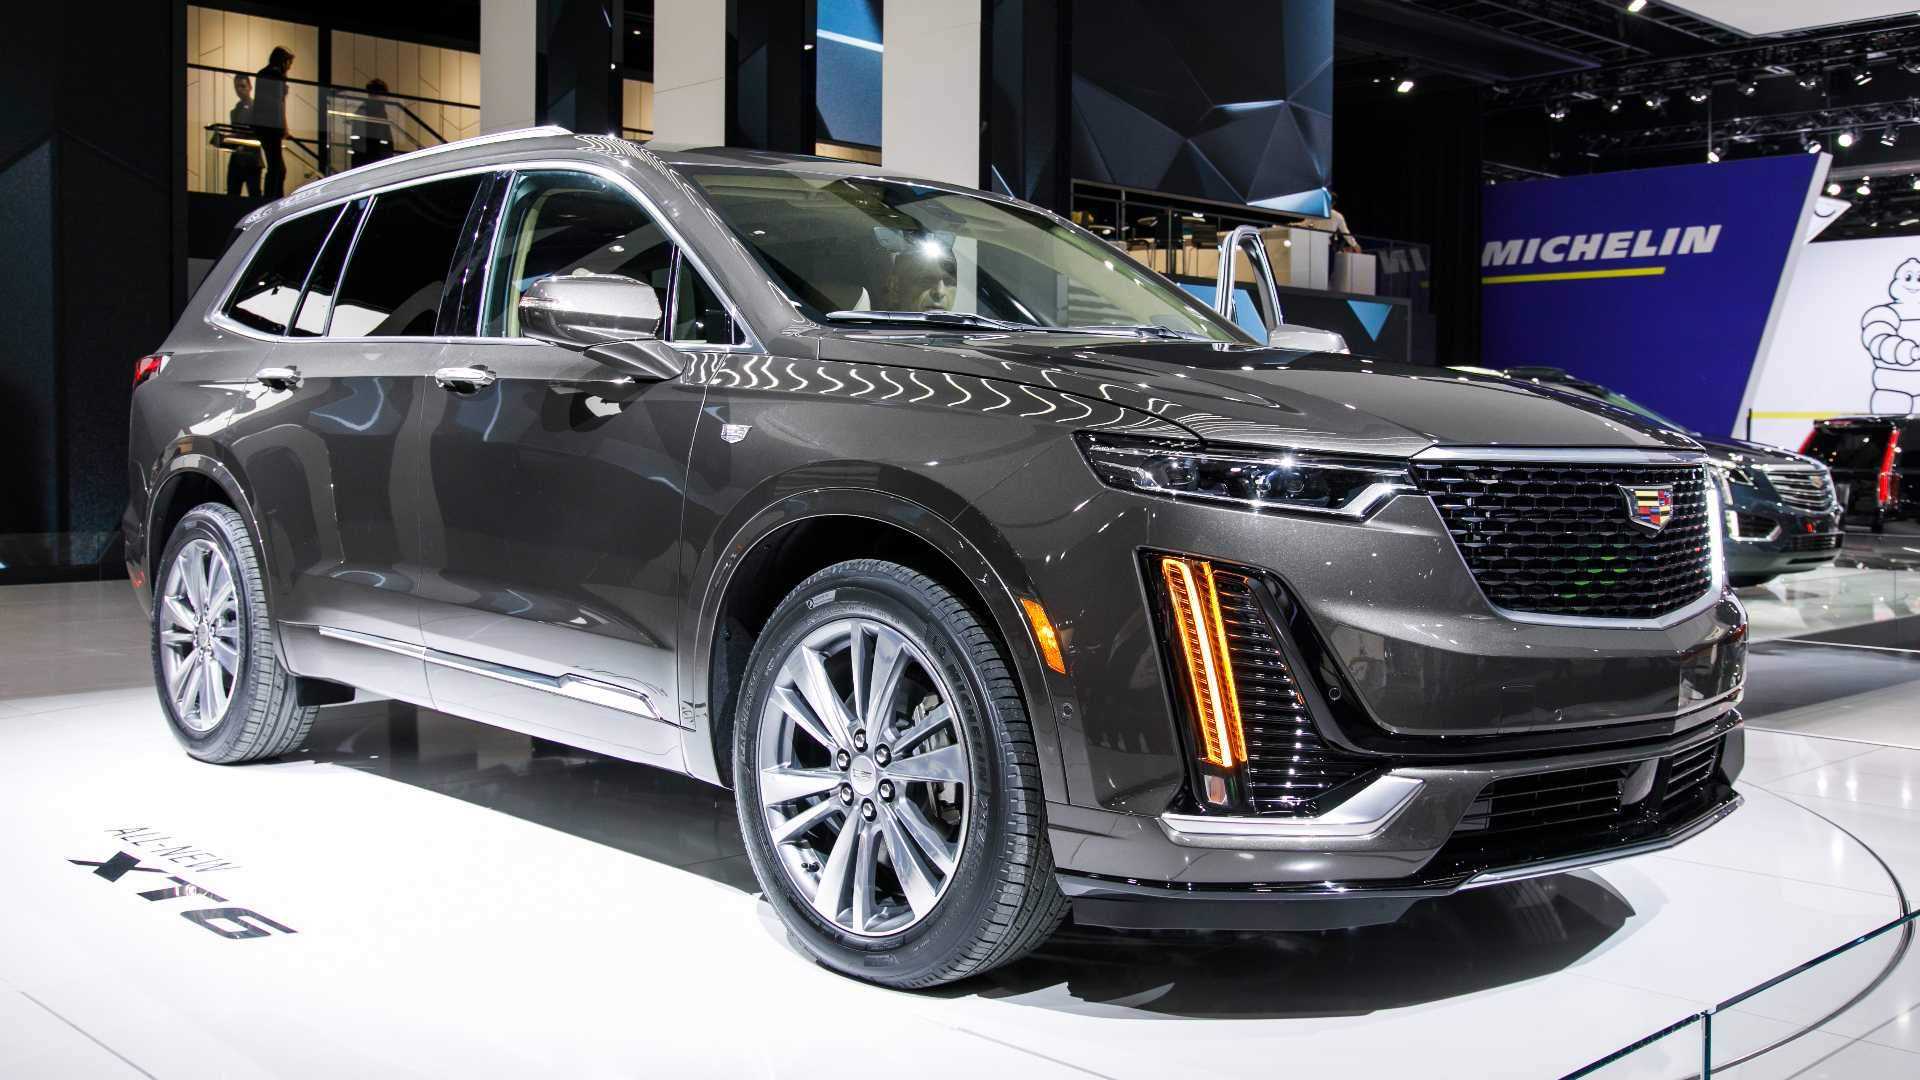 25 Great 2020 Cadillac Xt6 Availability Performance with 2020 Cadillac Xt6 Availability